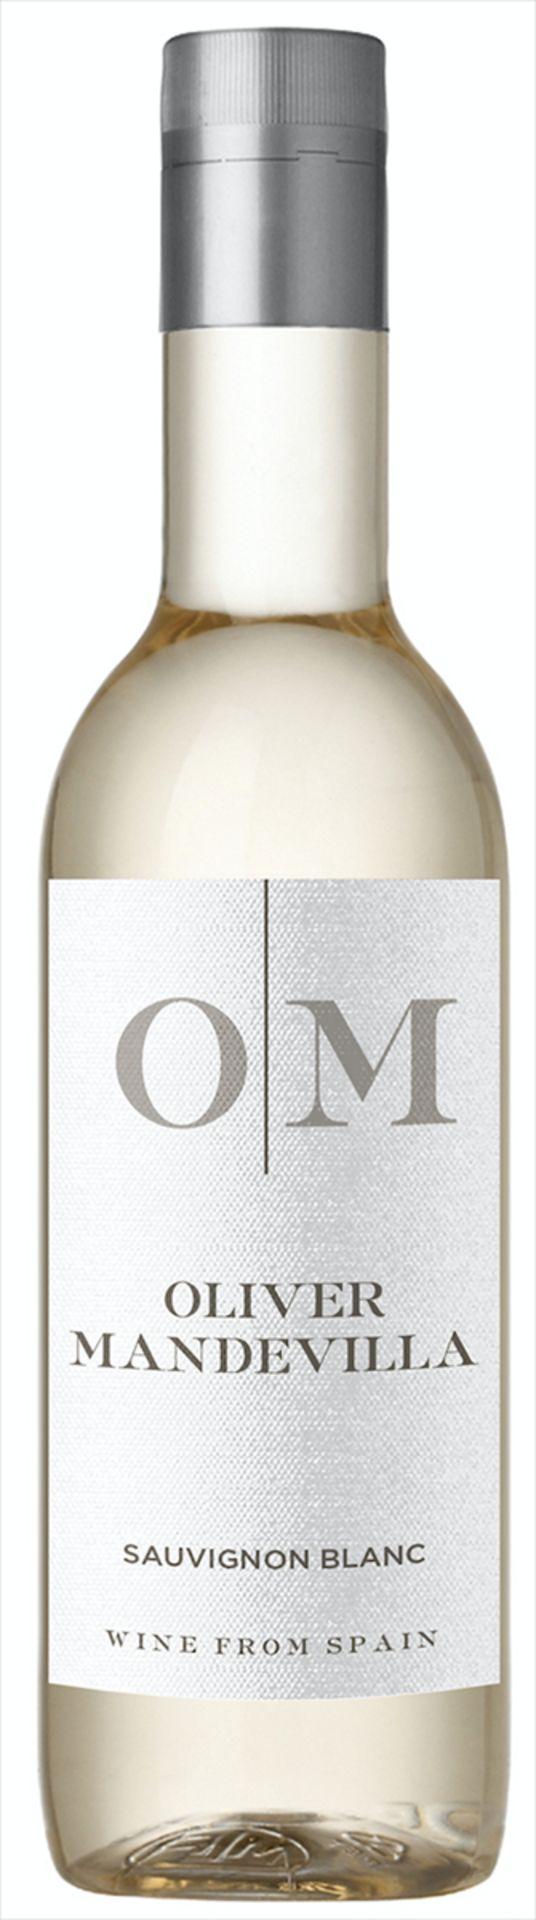 1 x Pallet of Oliver Mandevilla Sauvignon Blanc - Image 2 of 4